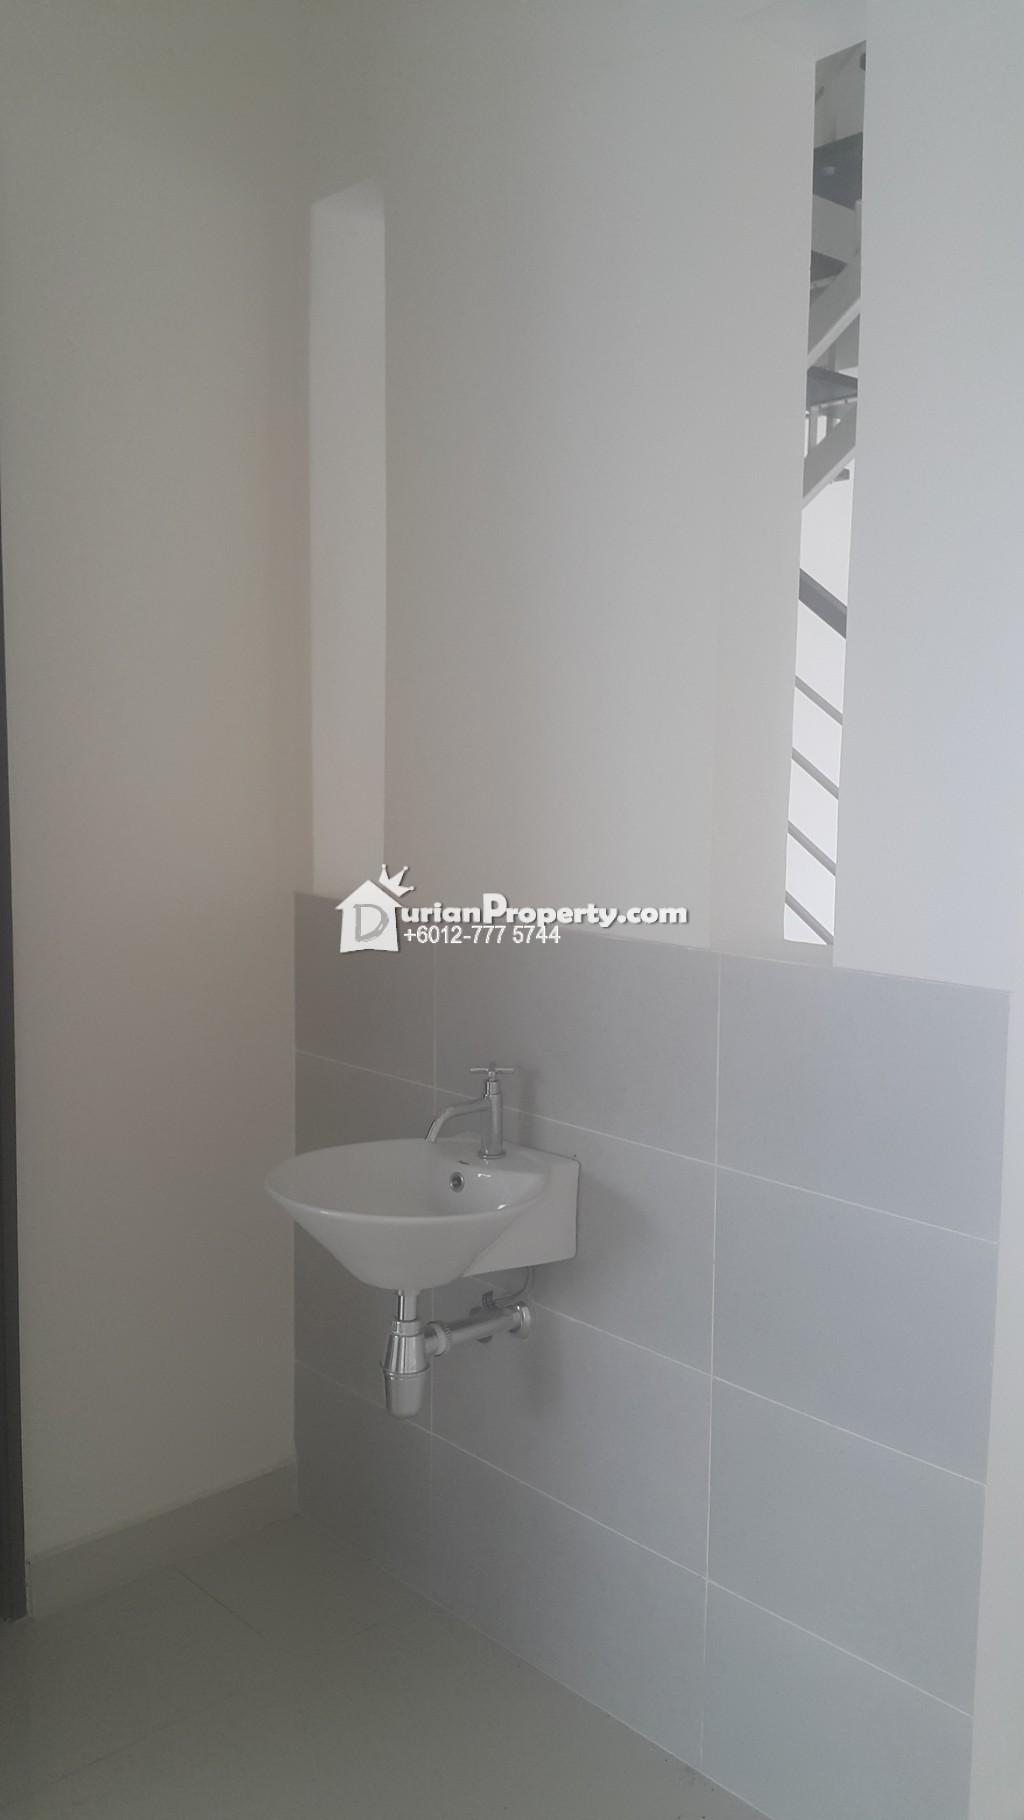 Bathroom Accessories Klang terrace house for sale at ken rimba jimbaran, klang for rm 715,000